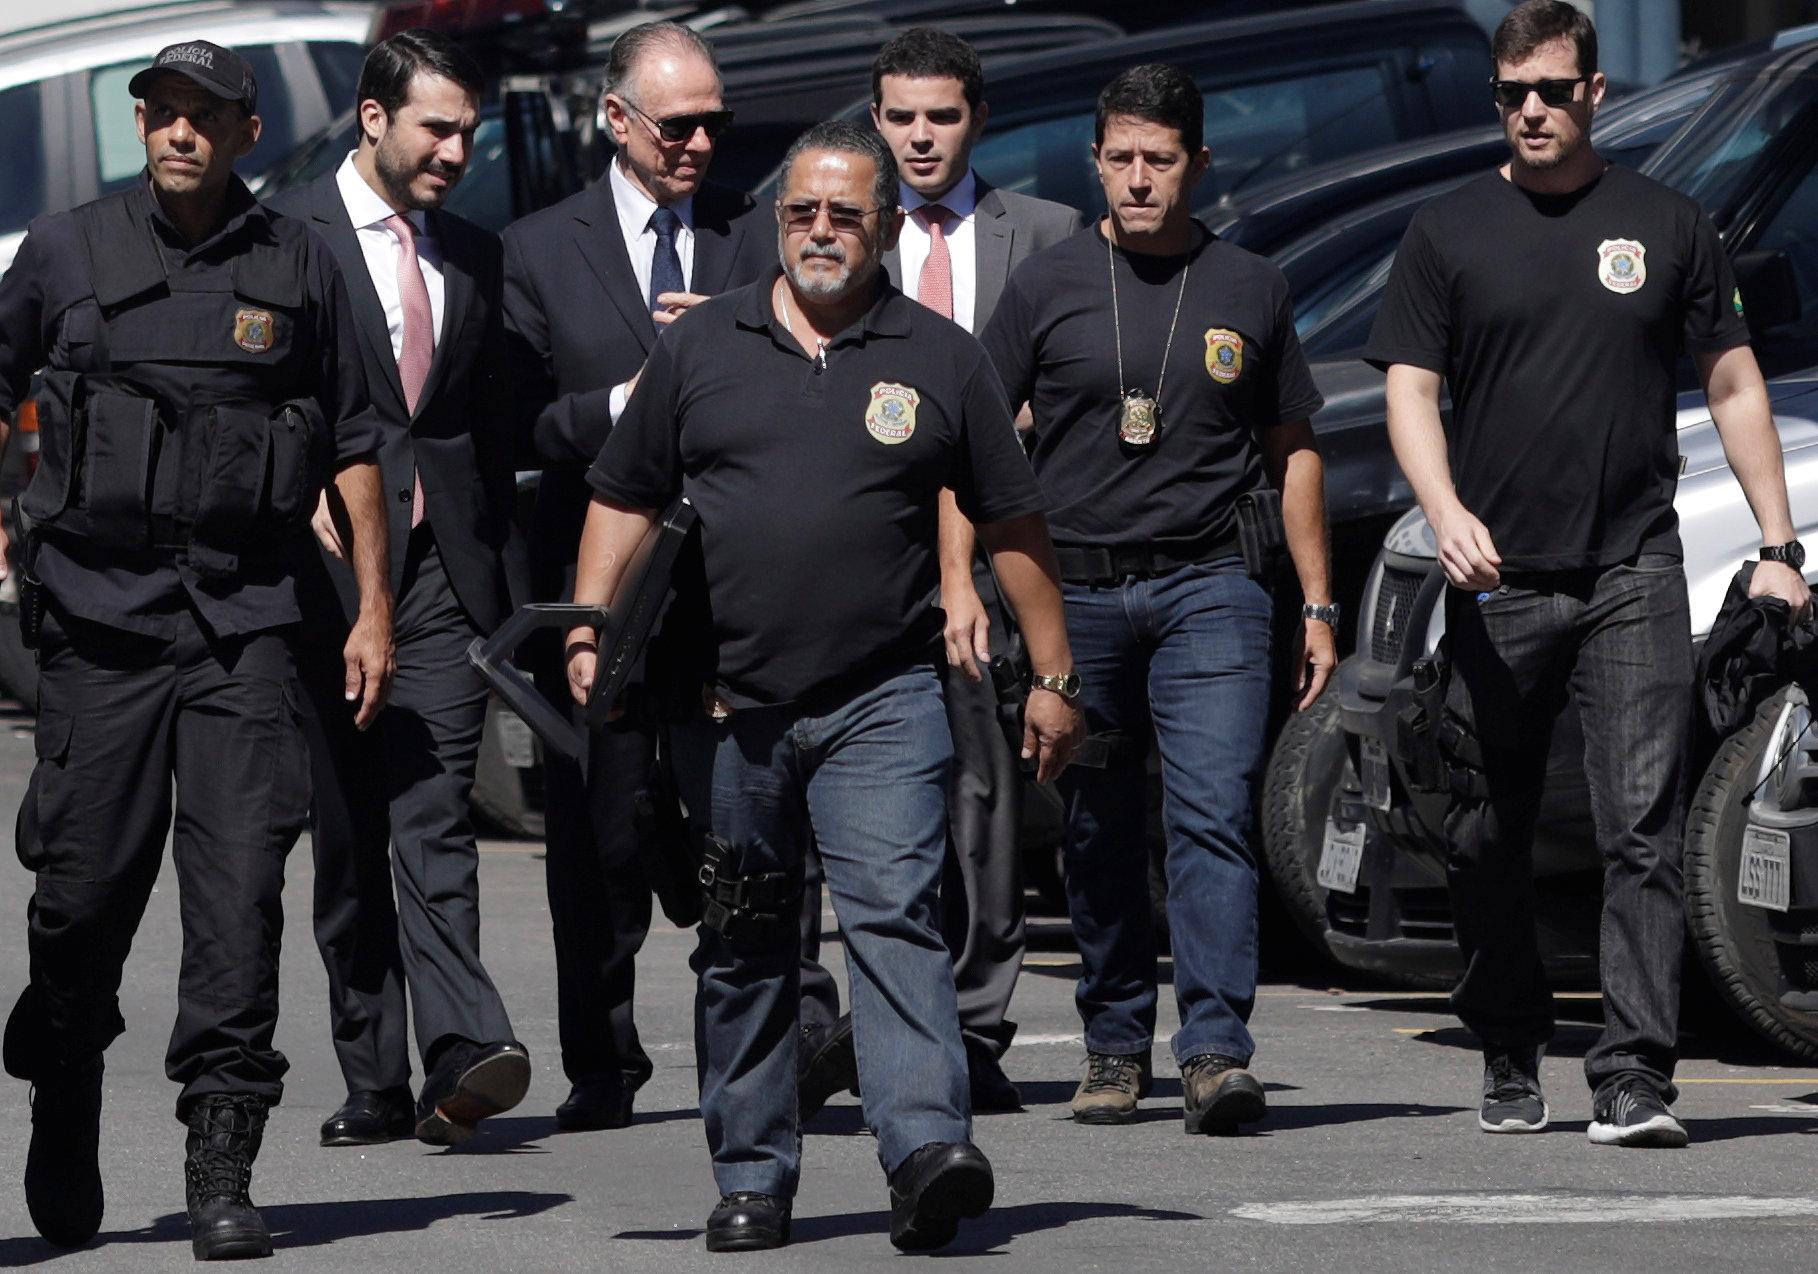 Brazilian Olympic Committee (COB) President Carlos Arthur Nuzman arrives to Federal Police headquarters in Rio de Janeiro, Brazil on Sept. 5, 2017. (REUTERS/Ricardo Moraes)